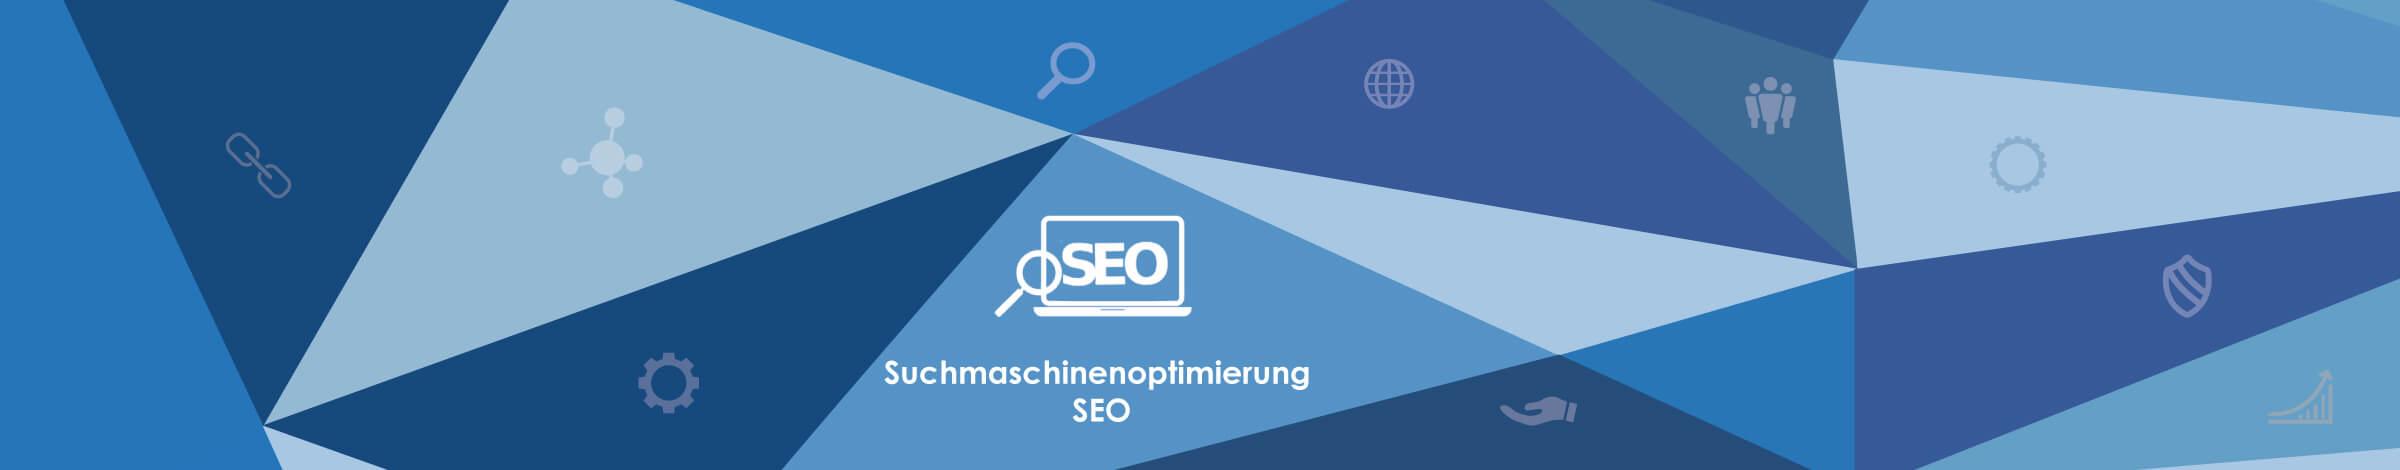 web_updates_kmu_wuk-ch_Suchmaschinenoptimierung_SEO